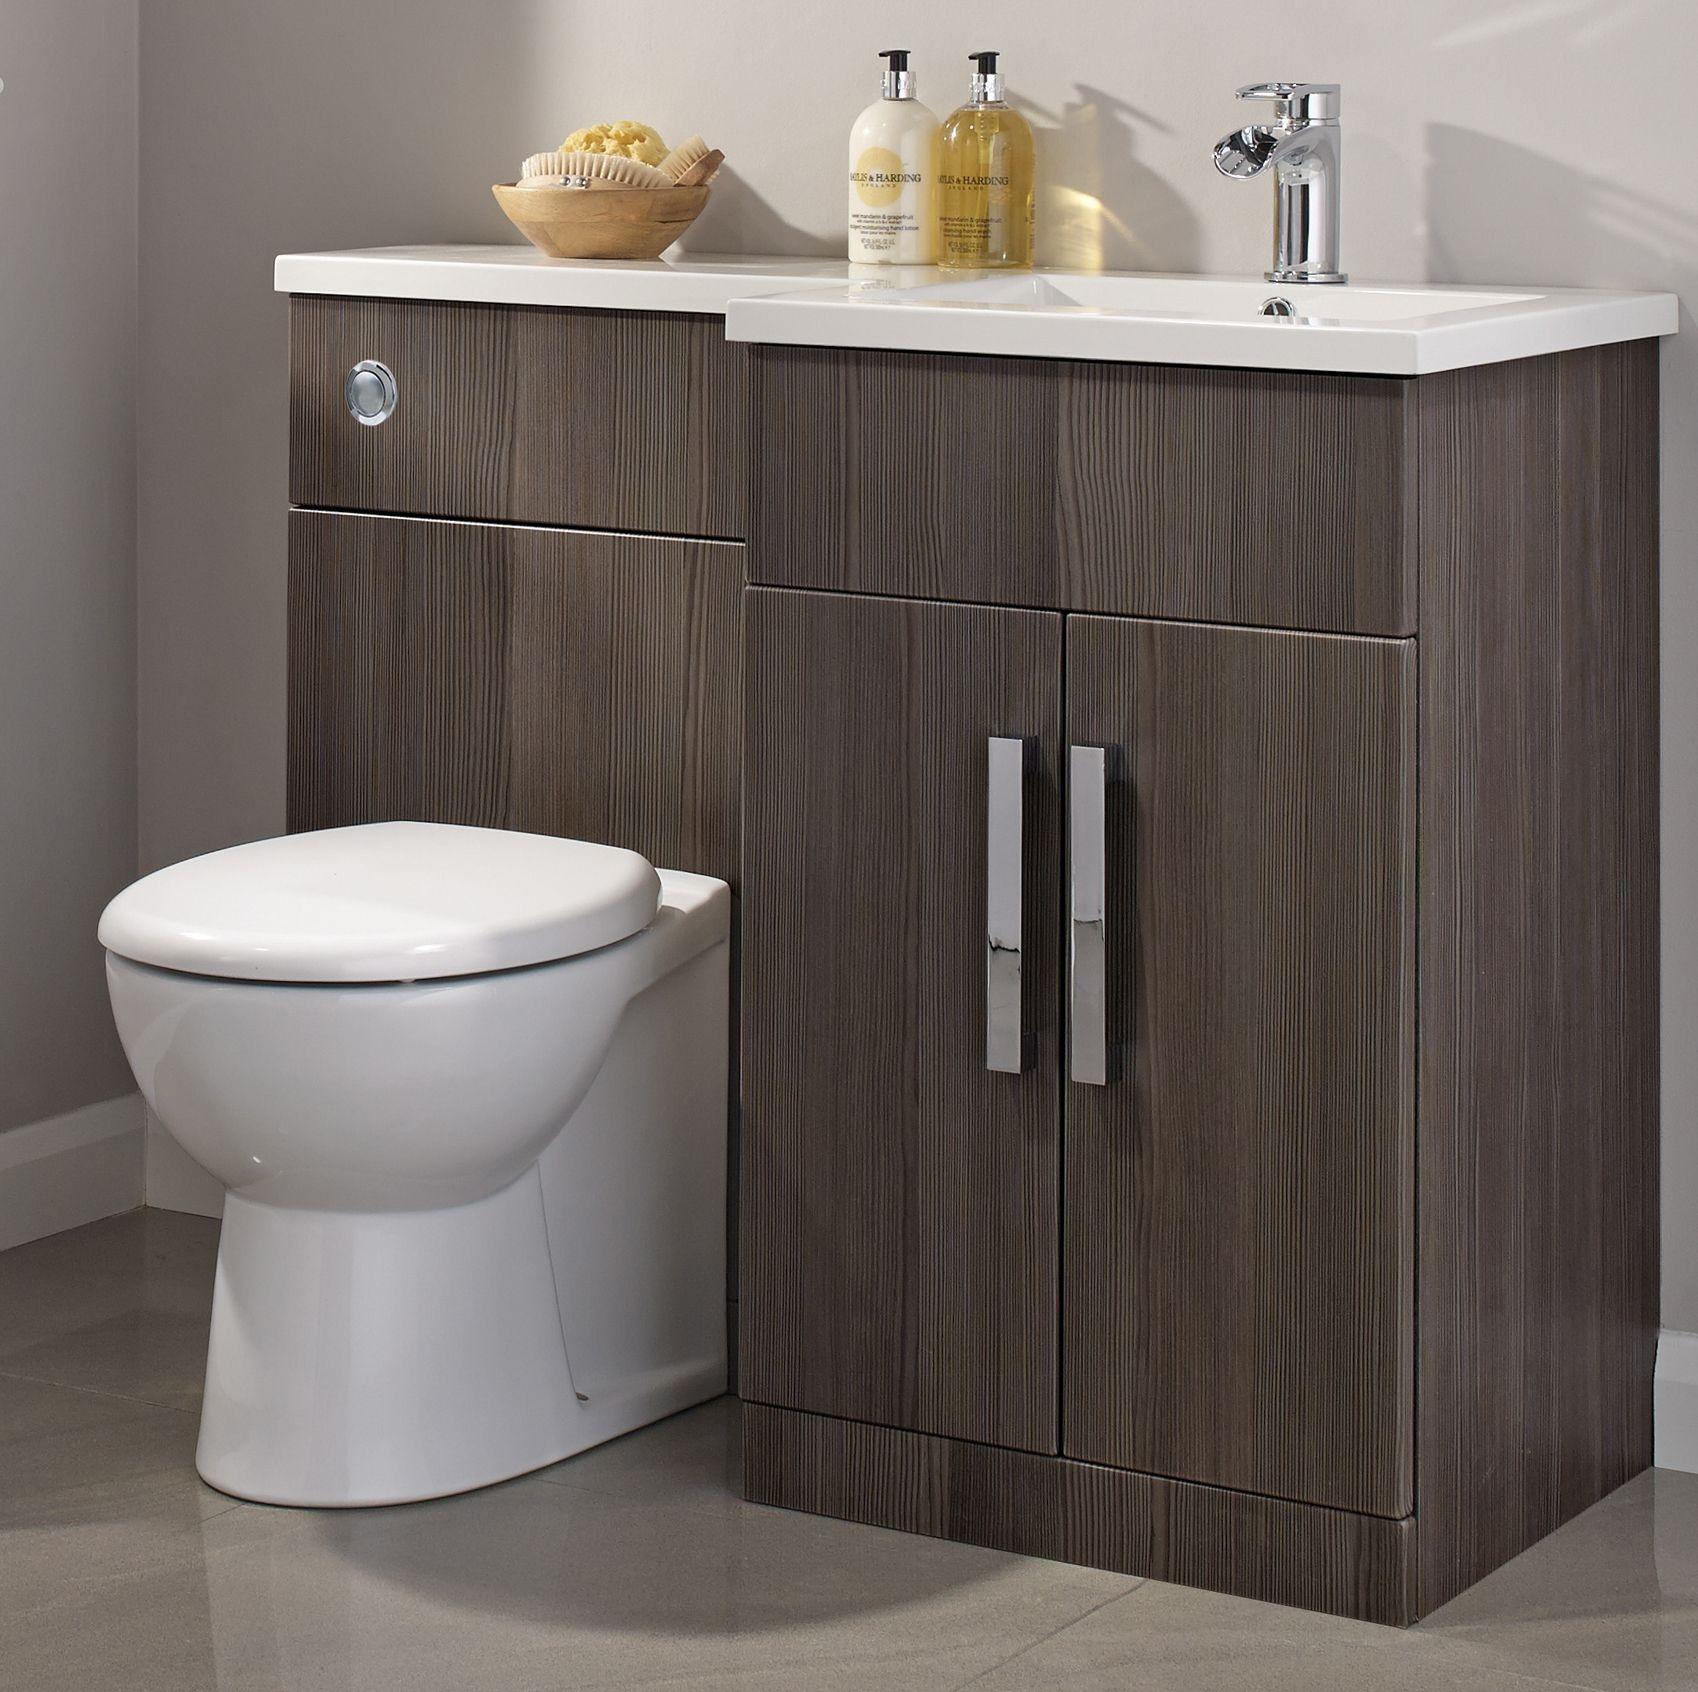 B Q Bathroom Furniture Faucet Ideas Site